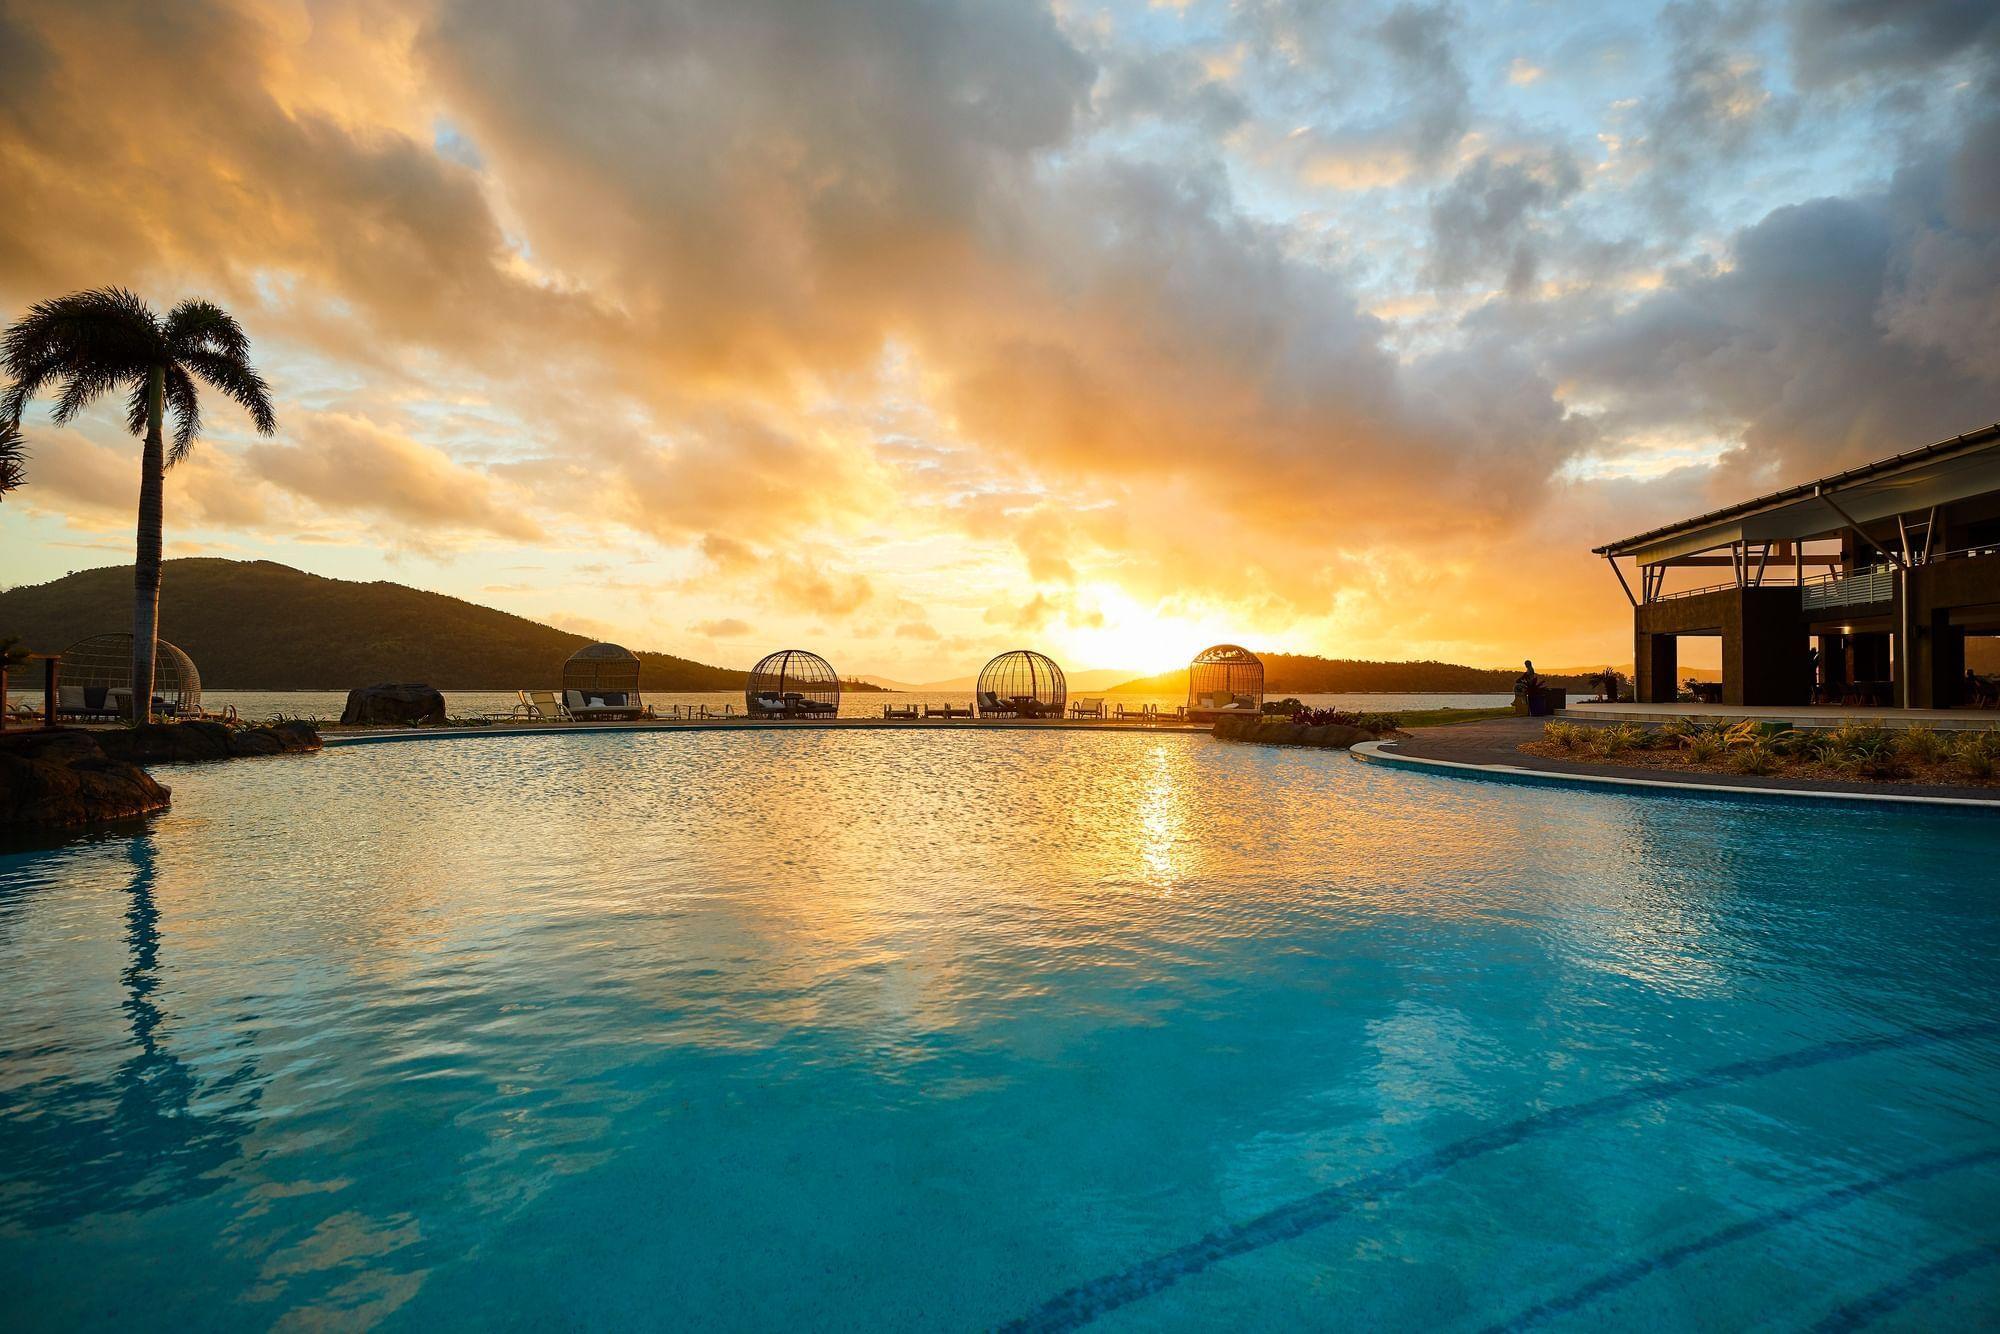 Swimming pool at sunset at Daydream Island Resort